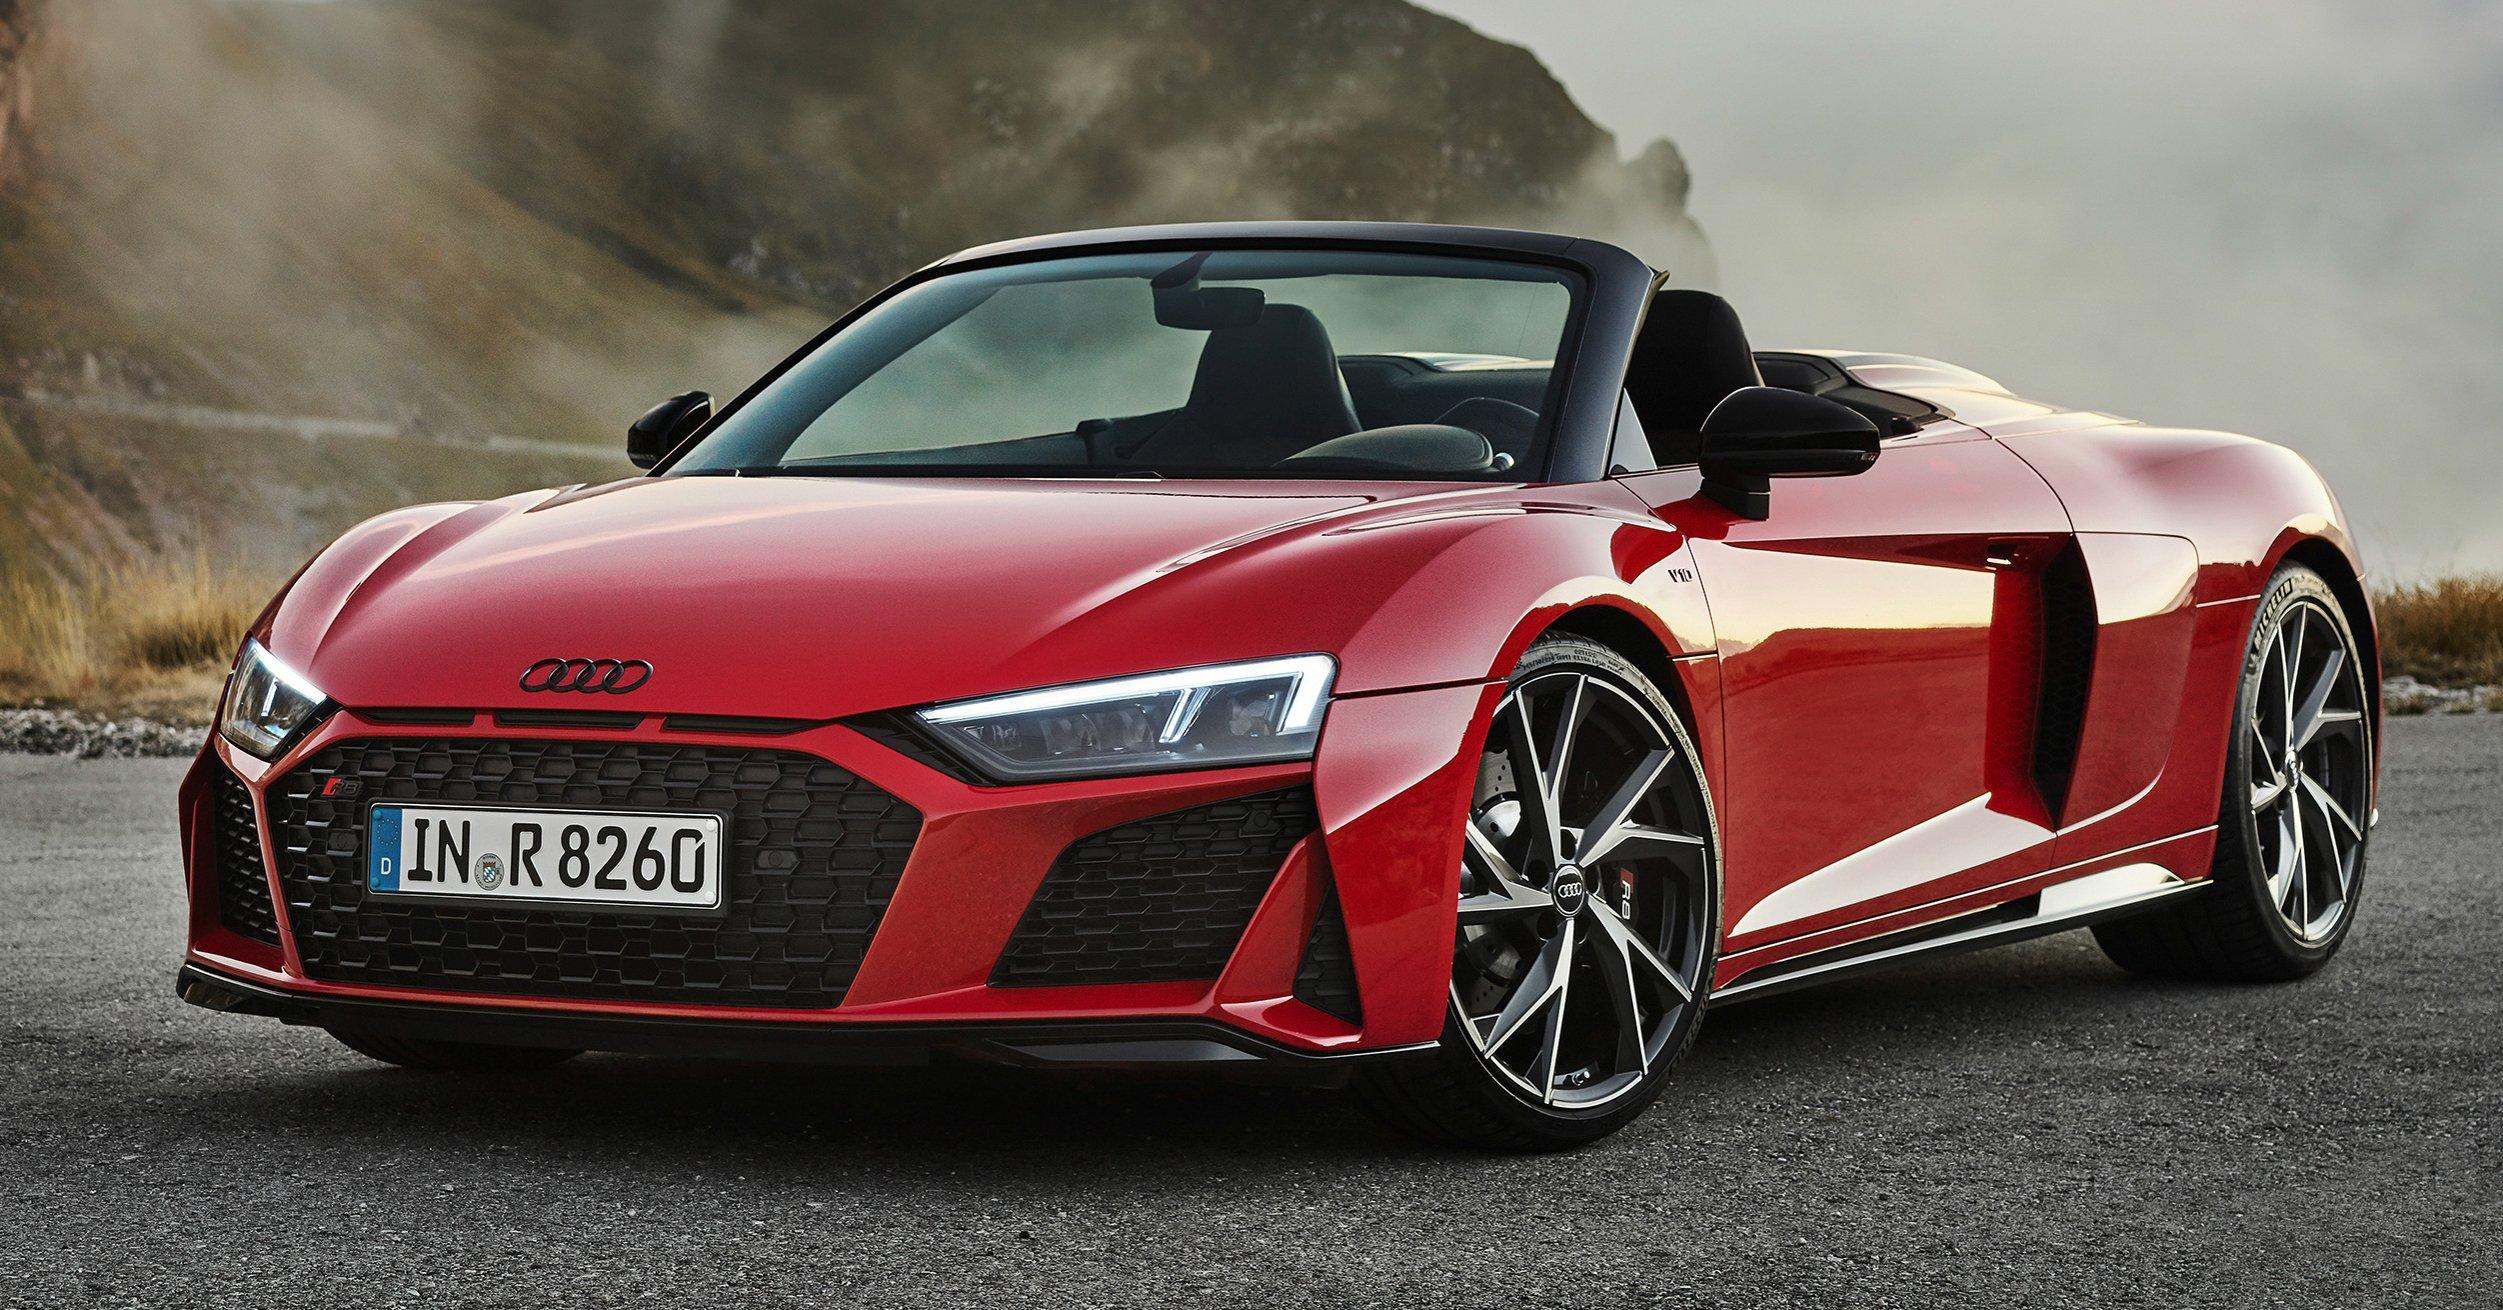 2020 Audi R8 V10 Rwd Returns As A Permanent Model Paultan Org